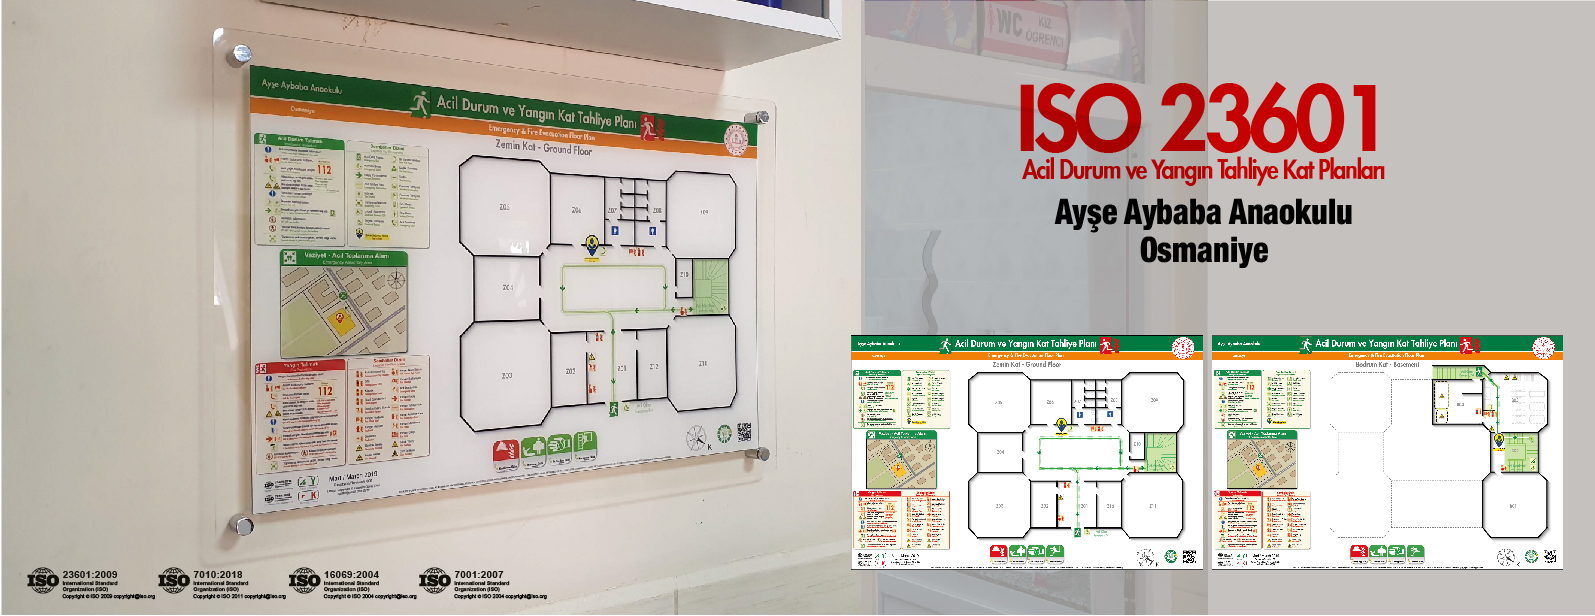 osmaniye ayse aybaba anaokulu ISO23601 Acil Durum ve Yangin Tahliye Kat Plani Pleksi